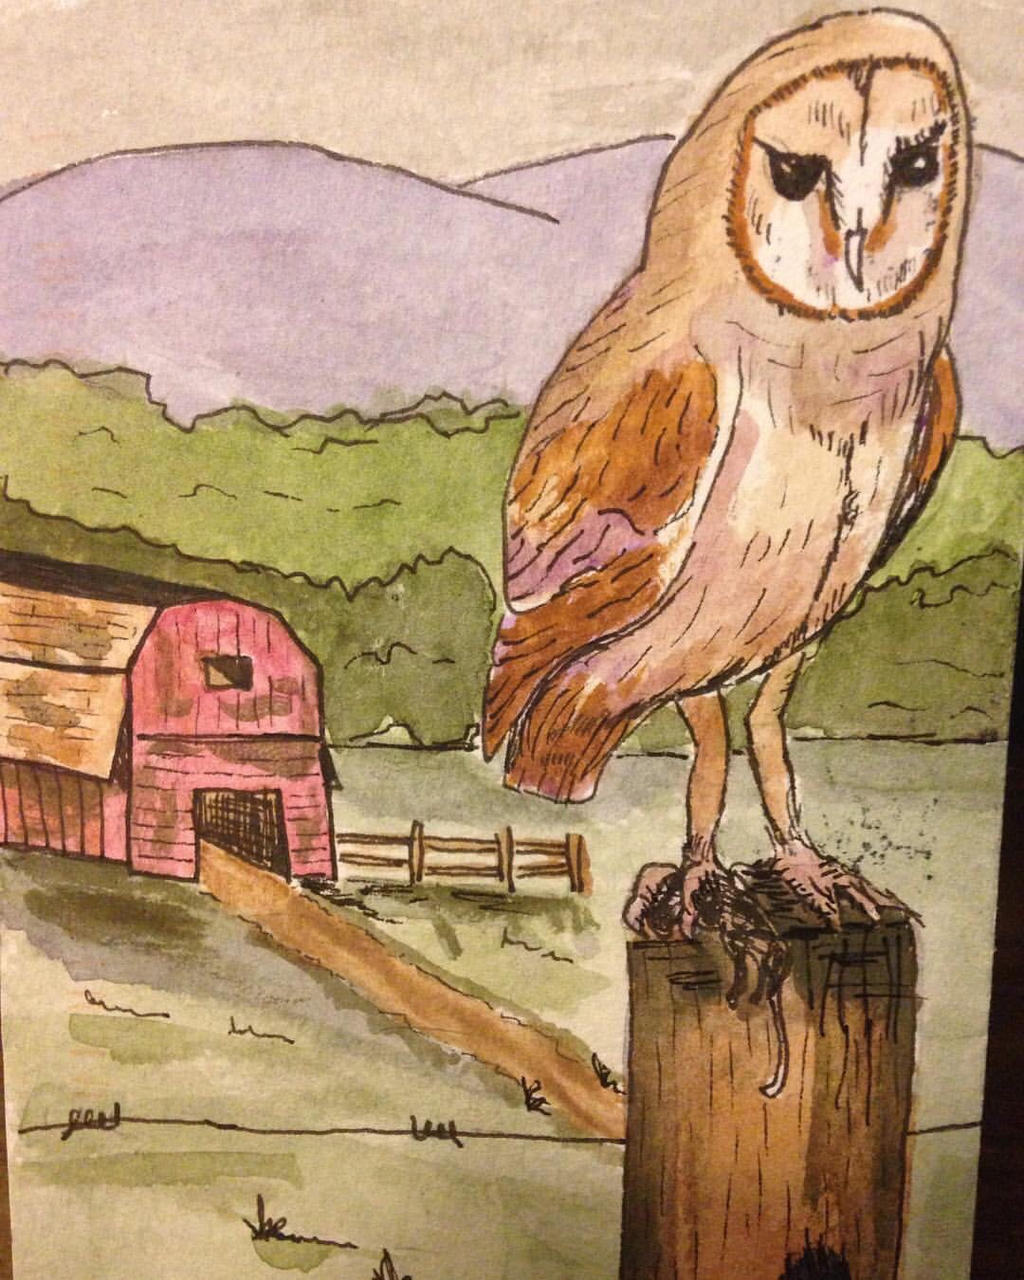 Barn owl by GentlestGiant